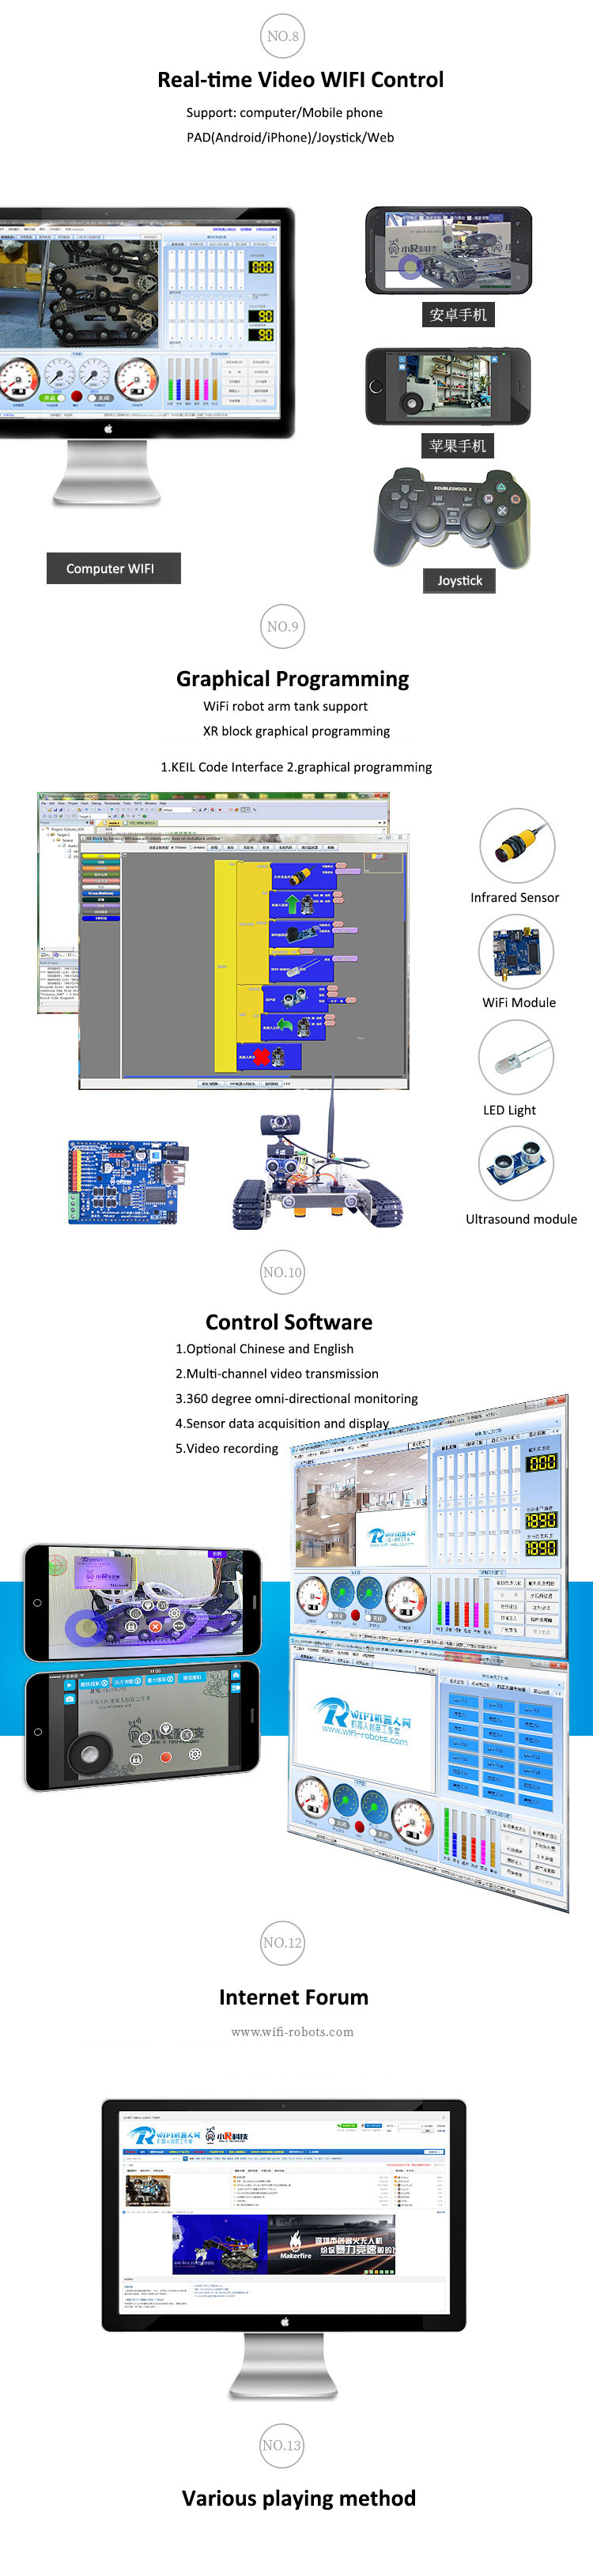 Xiao R DIY GFS WiFi Wireless Video Control Smart Robot Tank Car Kit